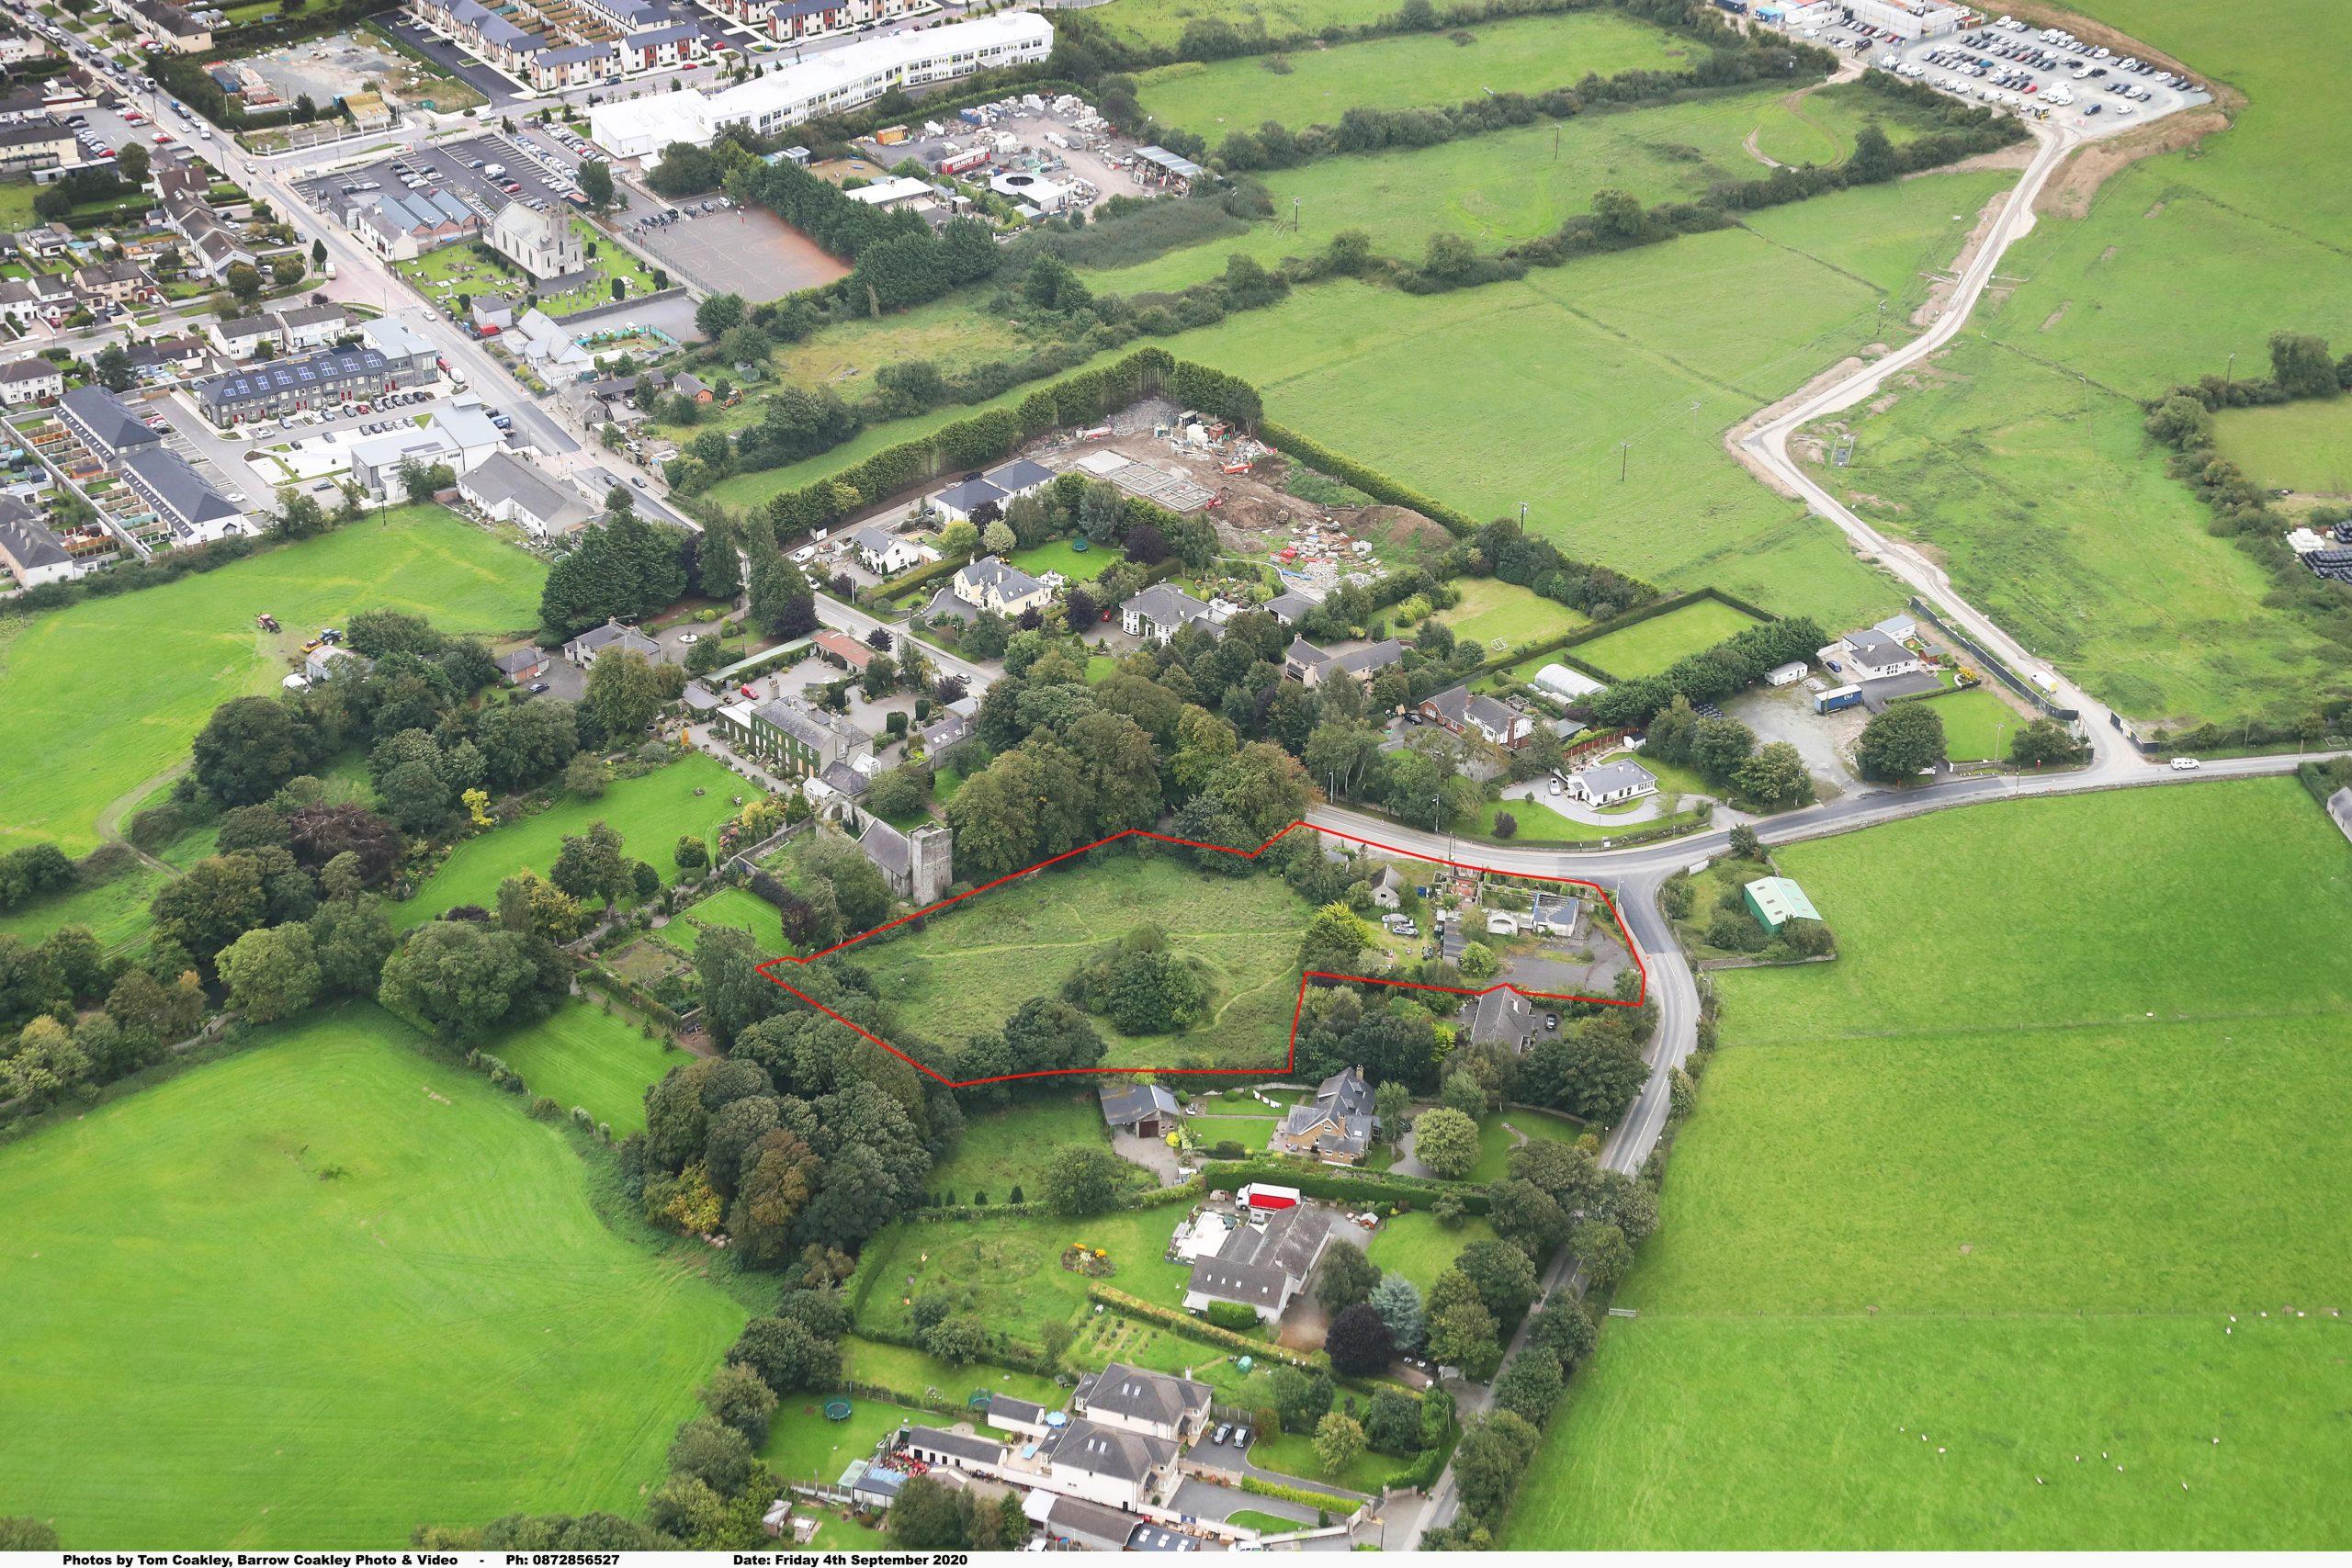 The Former McEvoys Public House and Lands, Main Street, Newcastle, County Dublin